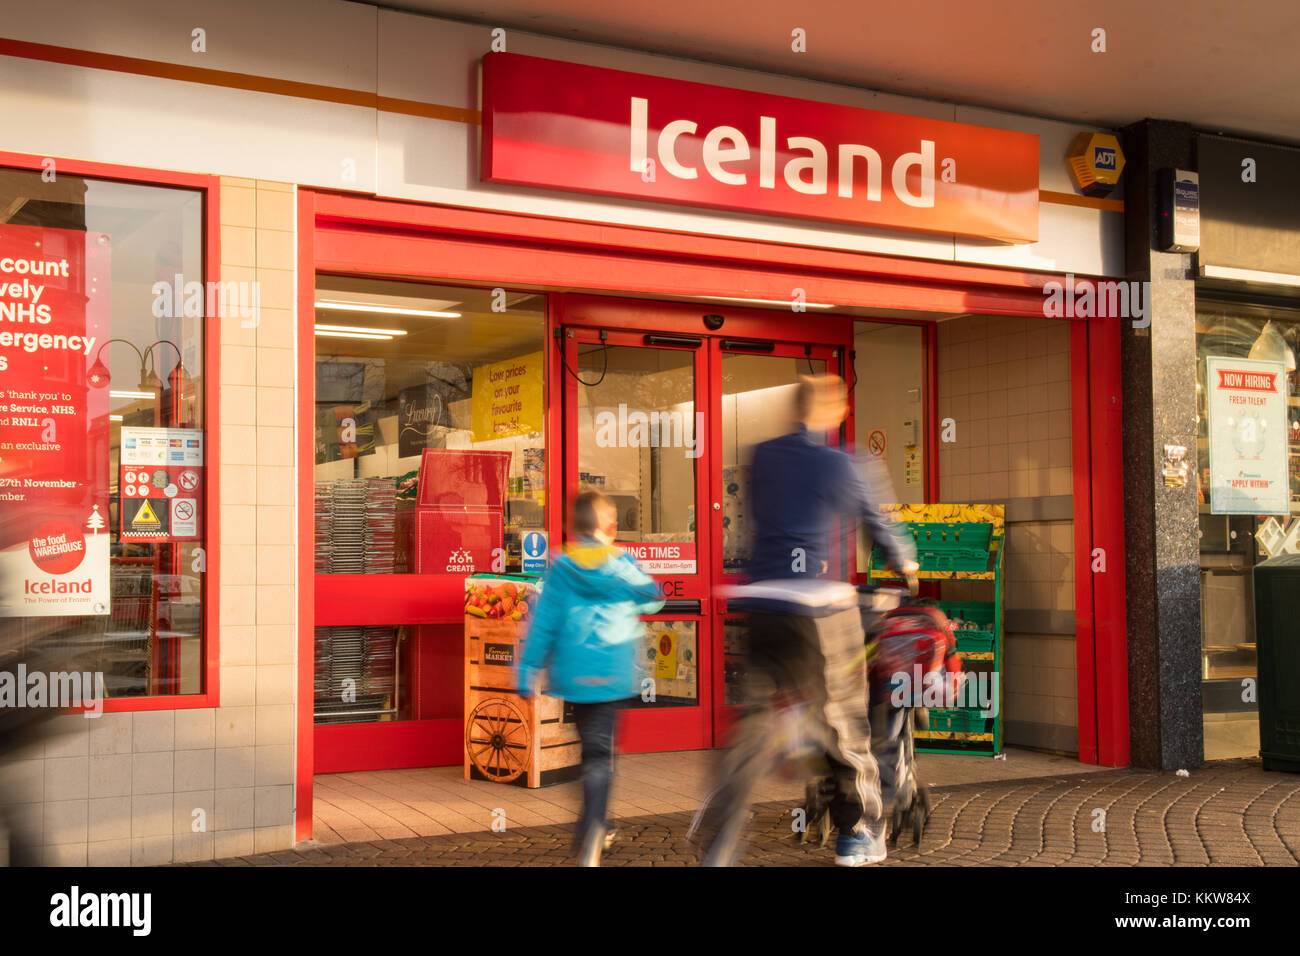 Iceland foods shop storefront - UK - Stock Image